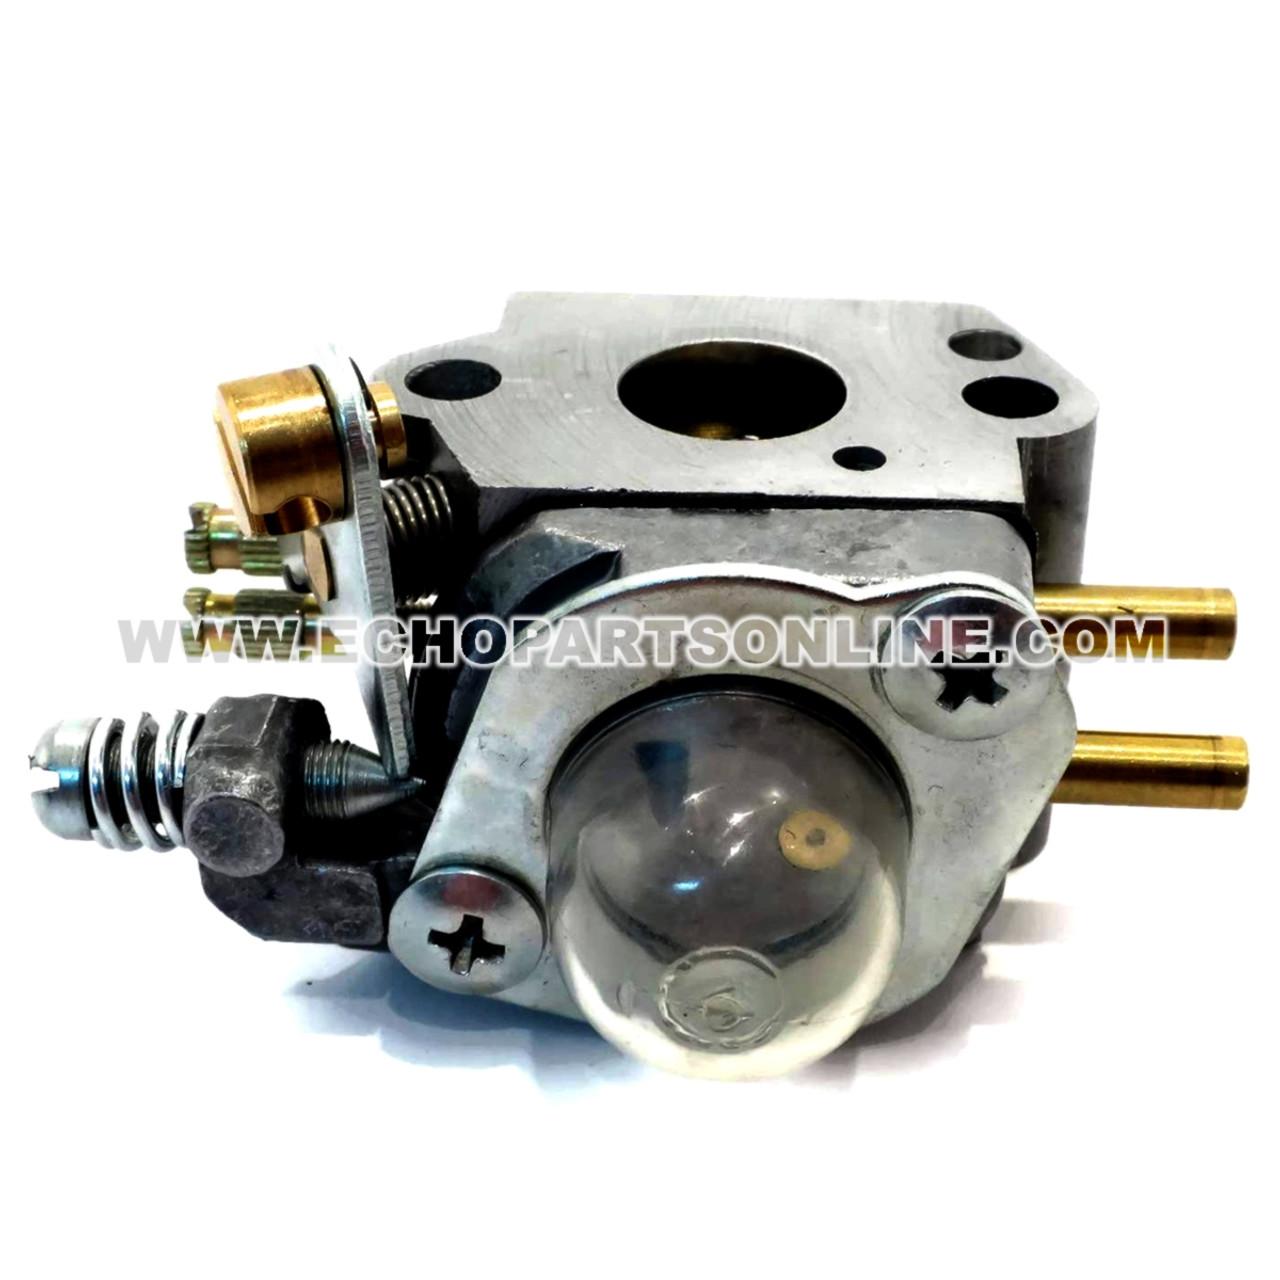 Echo GT 2400 Carburetor 12520013317 bottom view